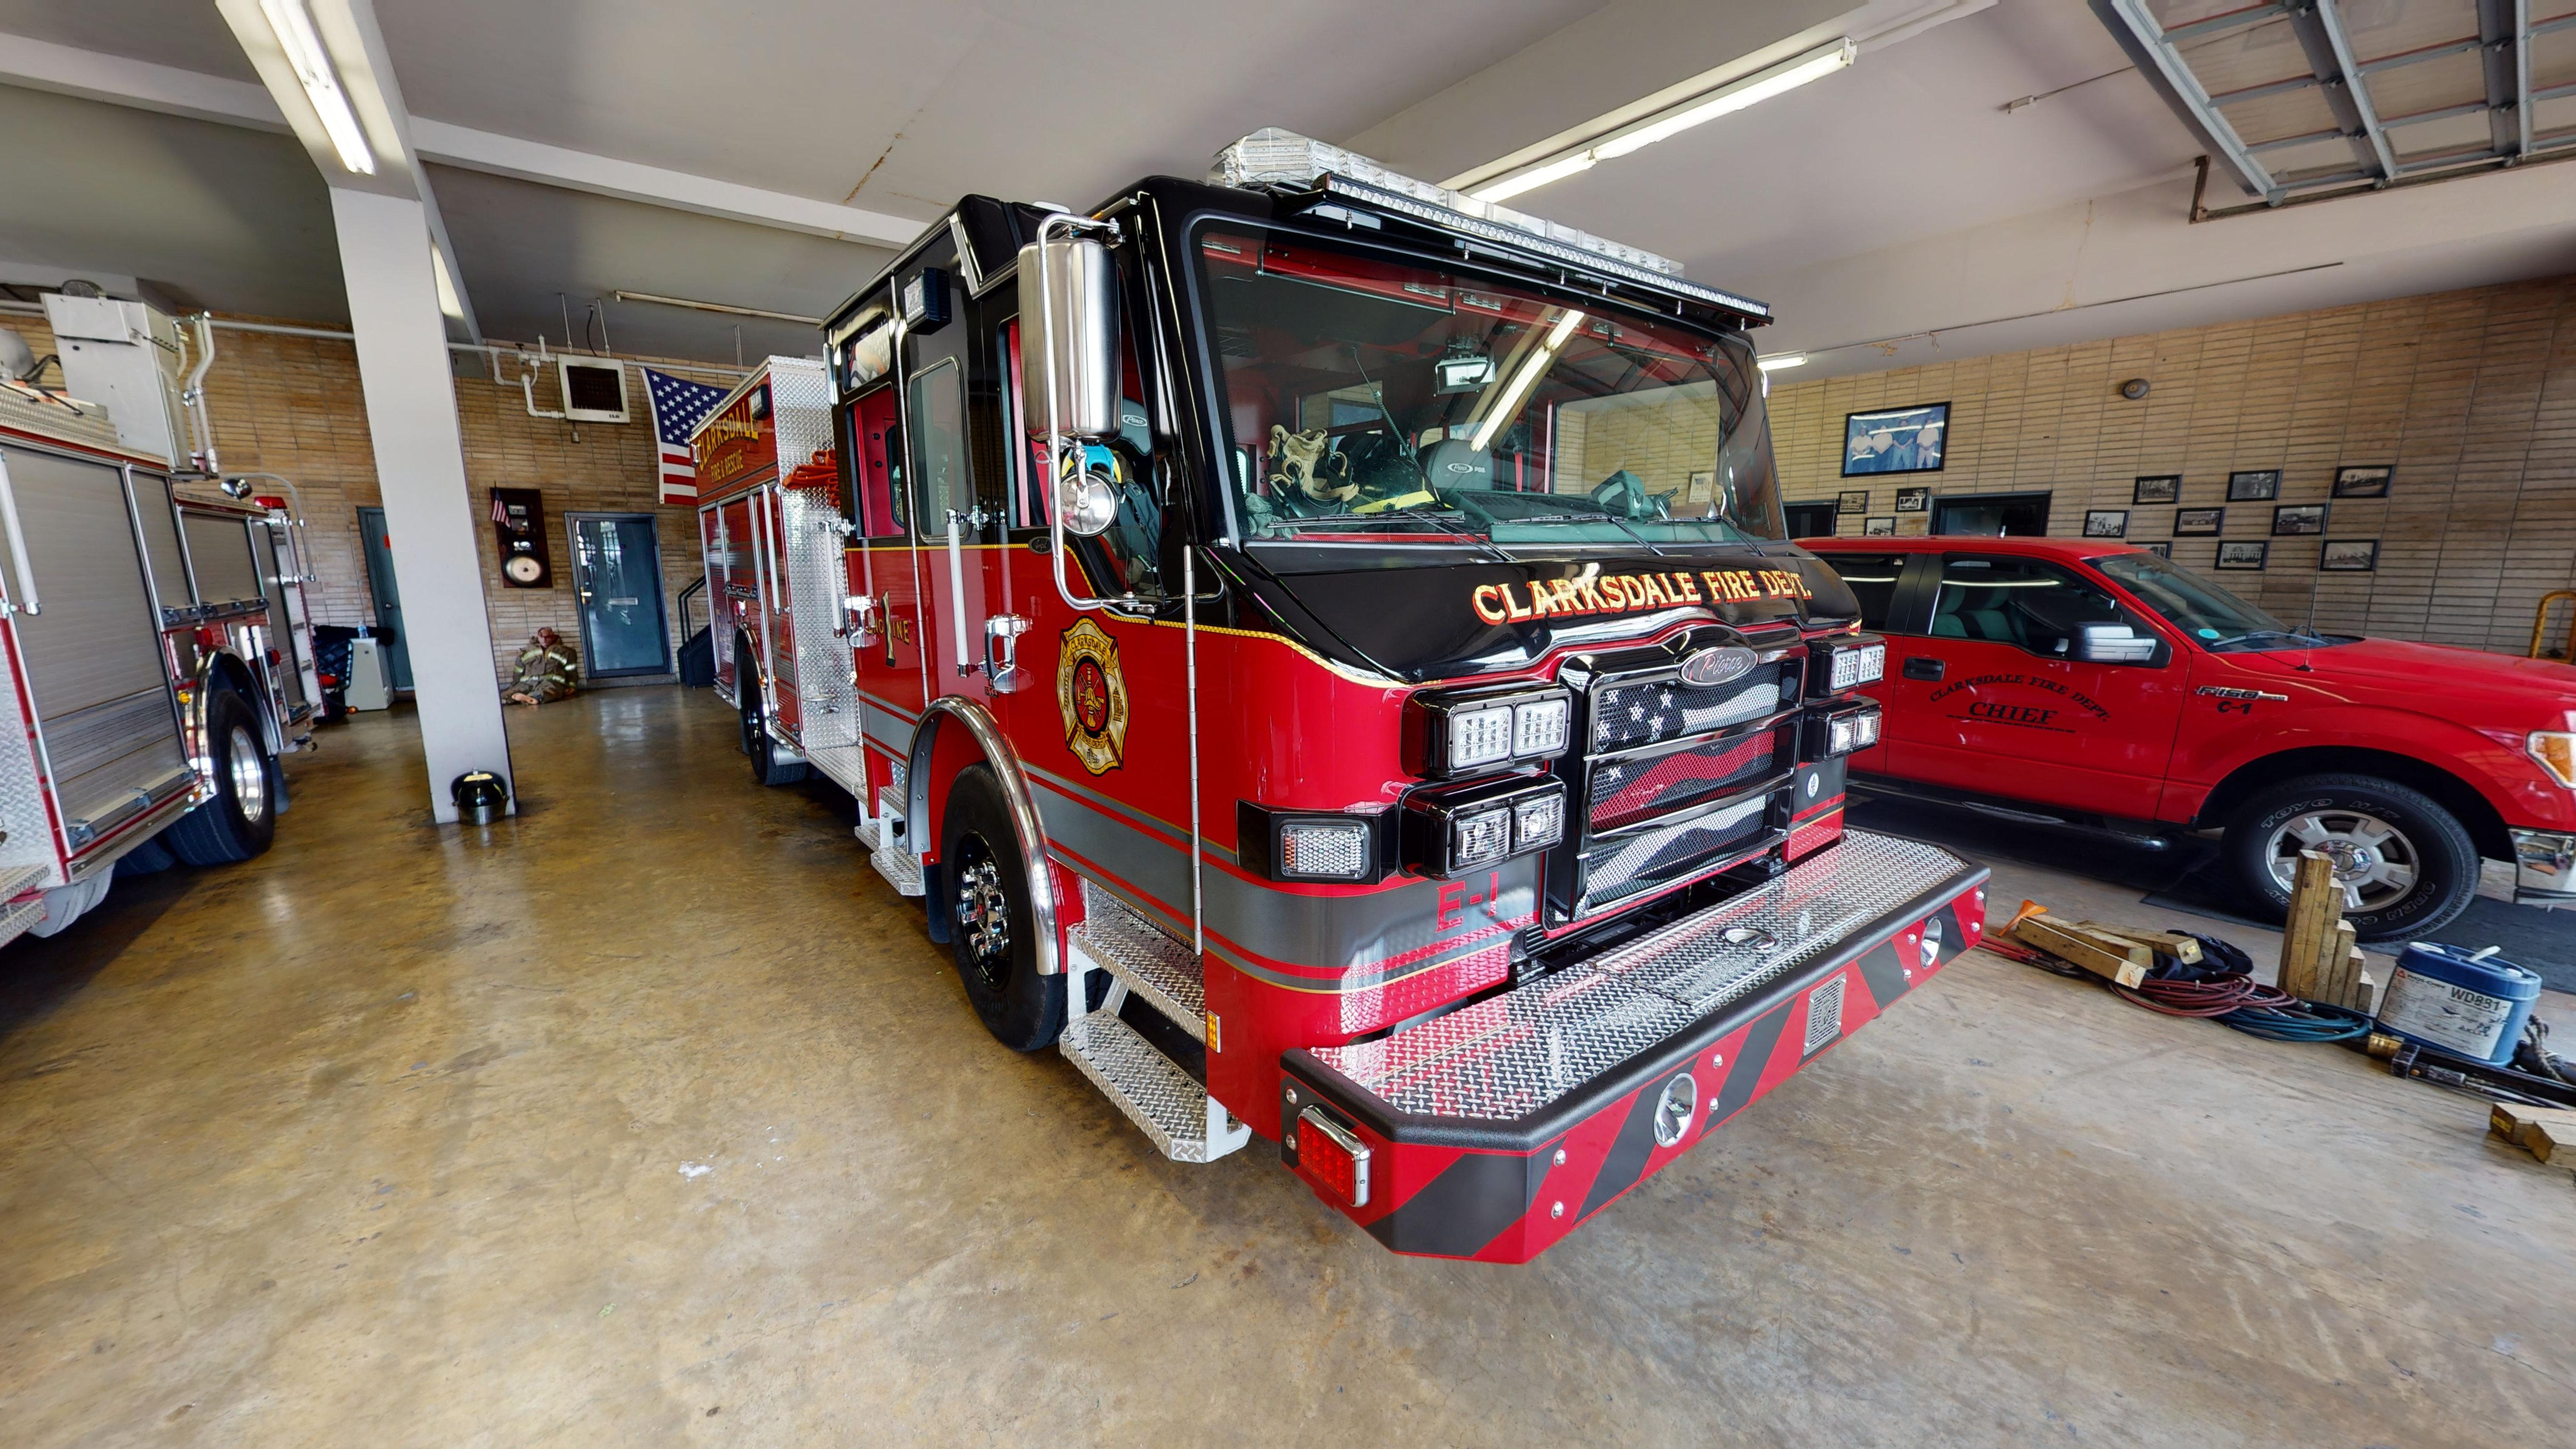 6_Clarksdale-Fire-Dept-06072021_133615